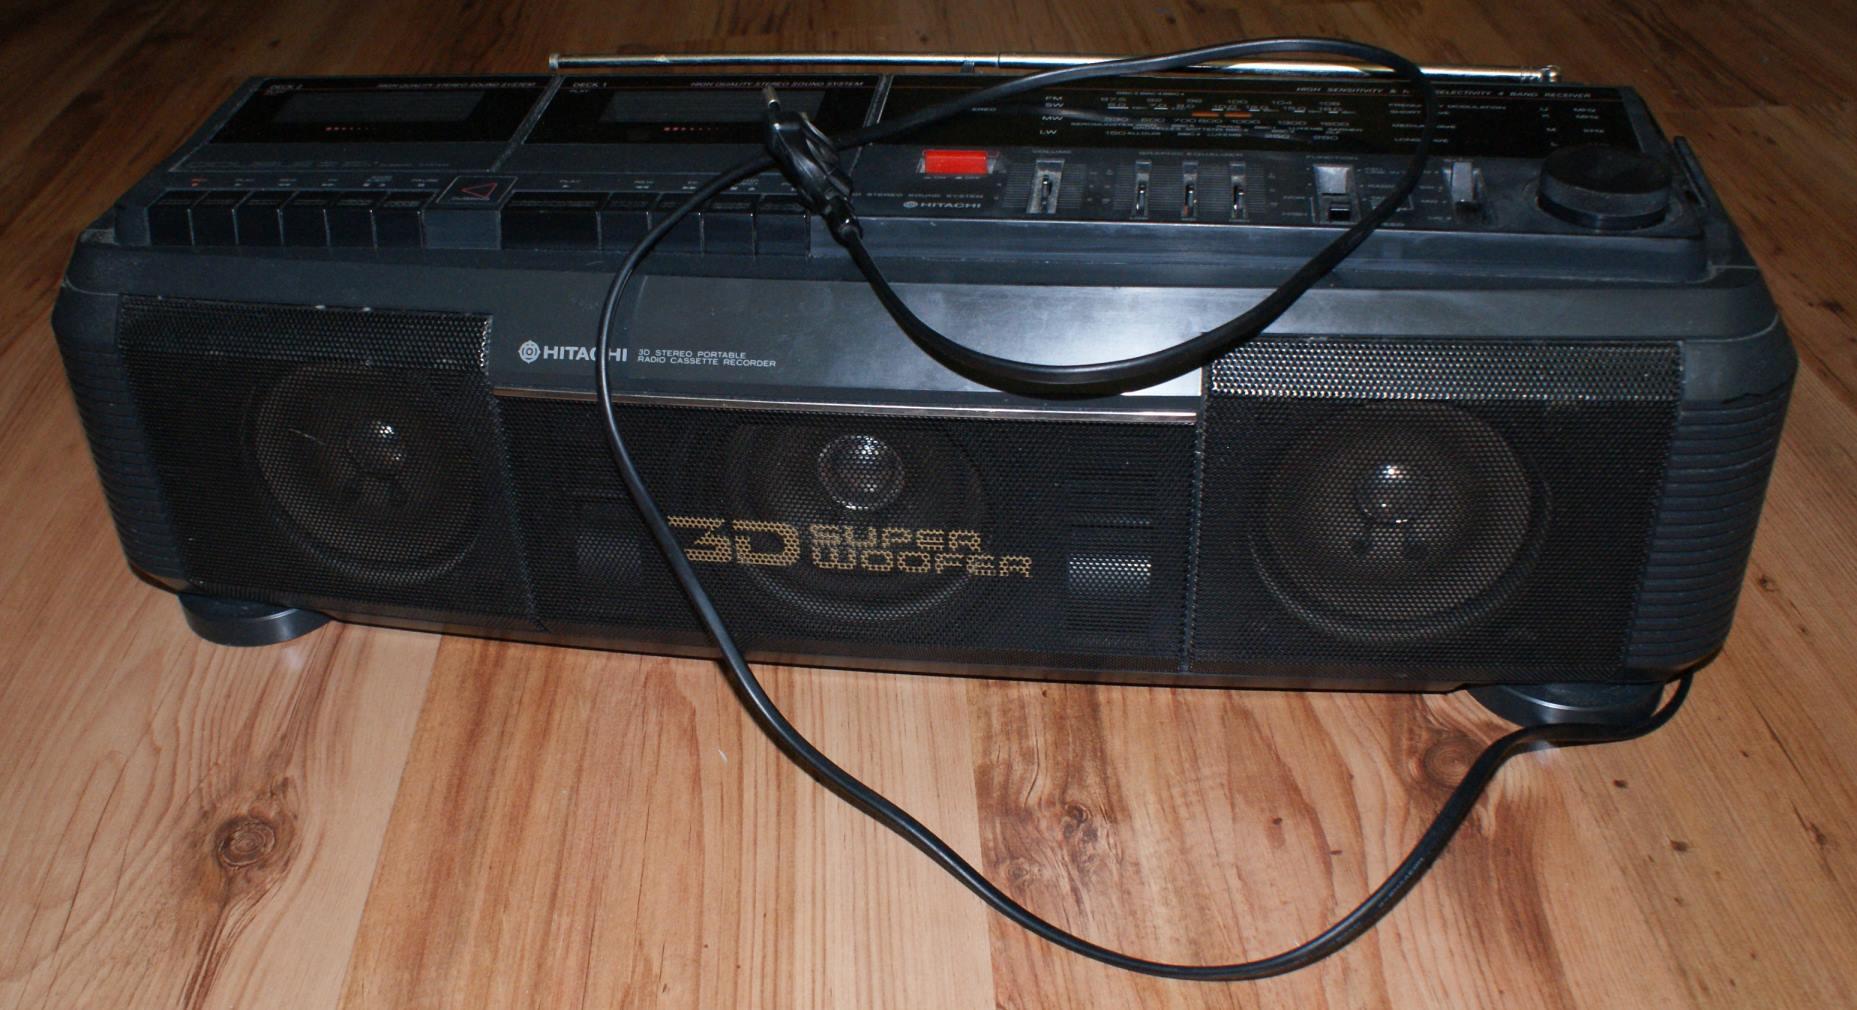 [Sprzedam] Radiomagnetofon Hitachi 3D super woofer KIELCE